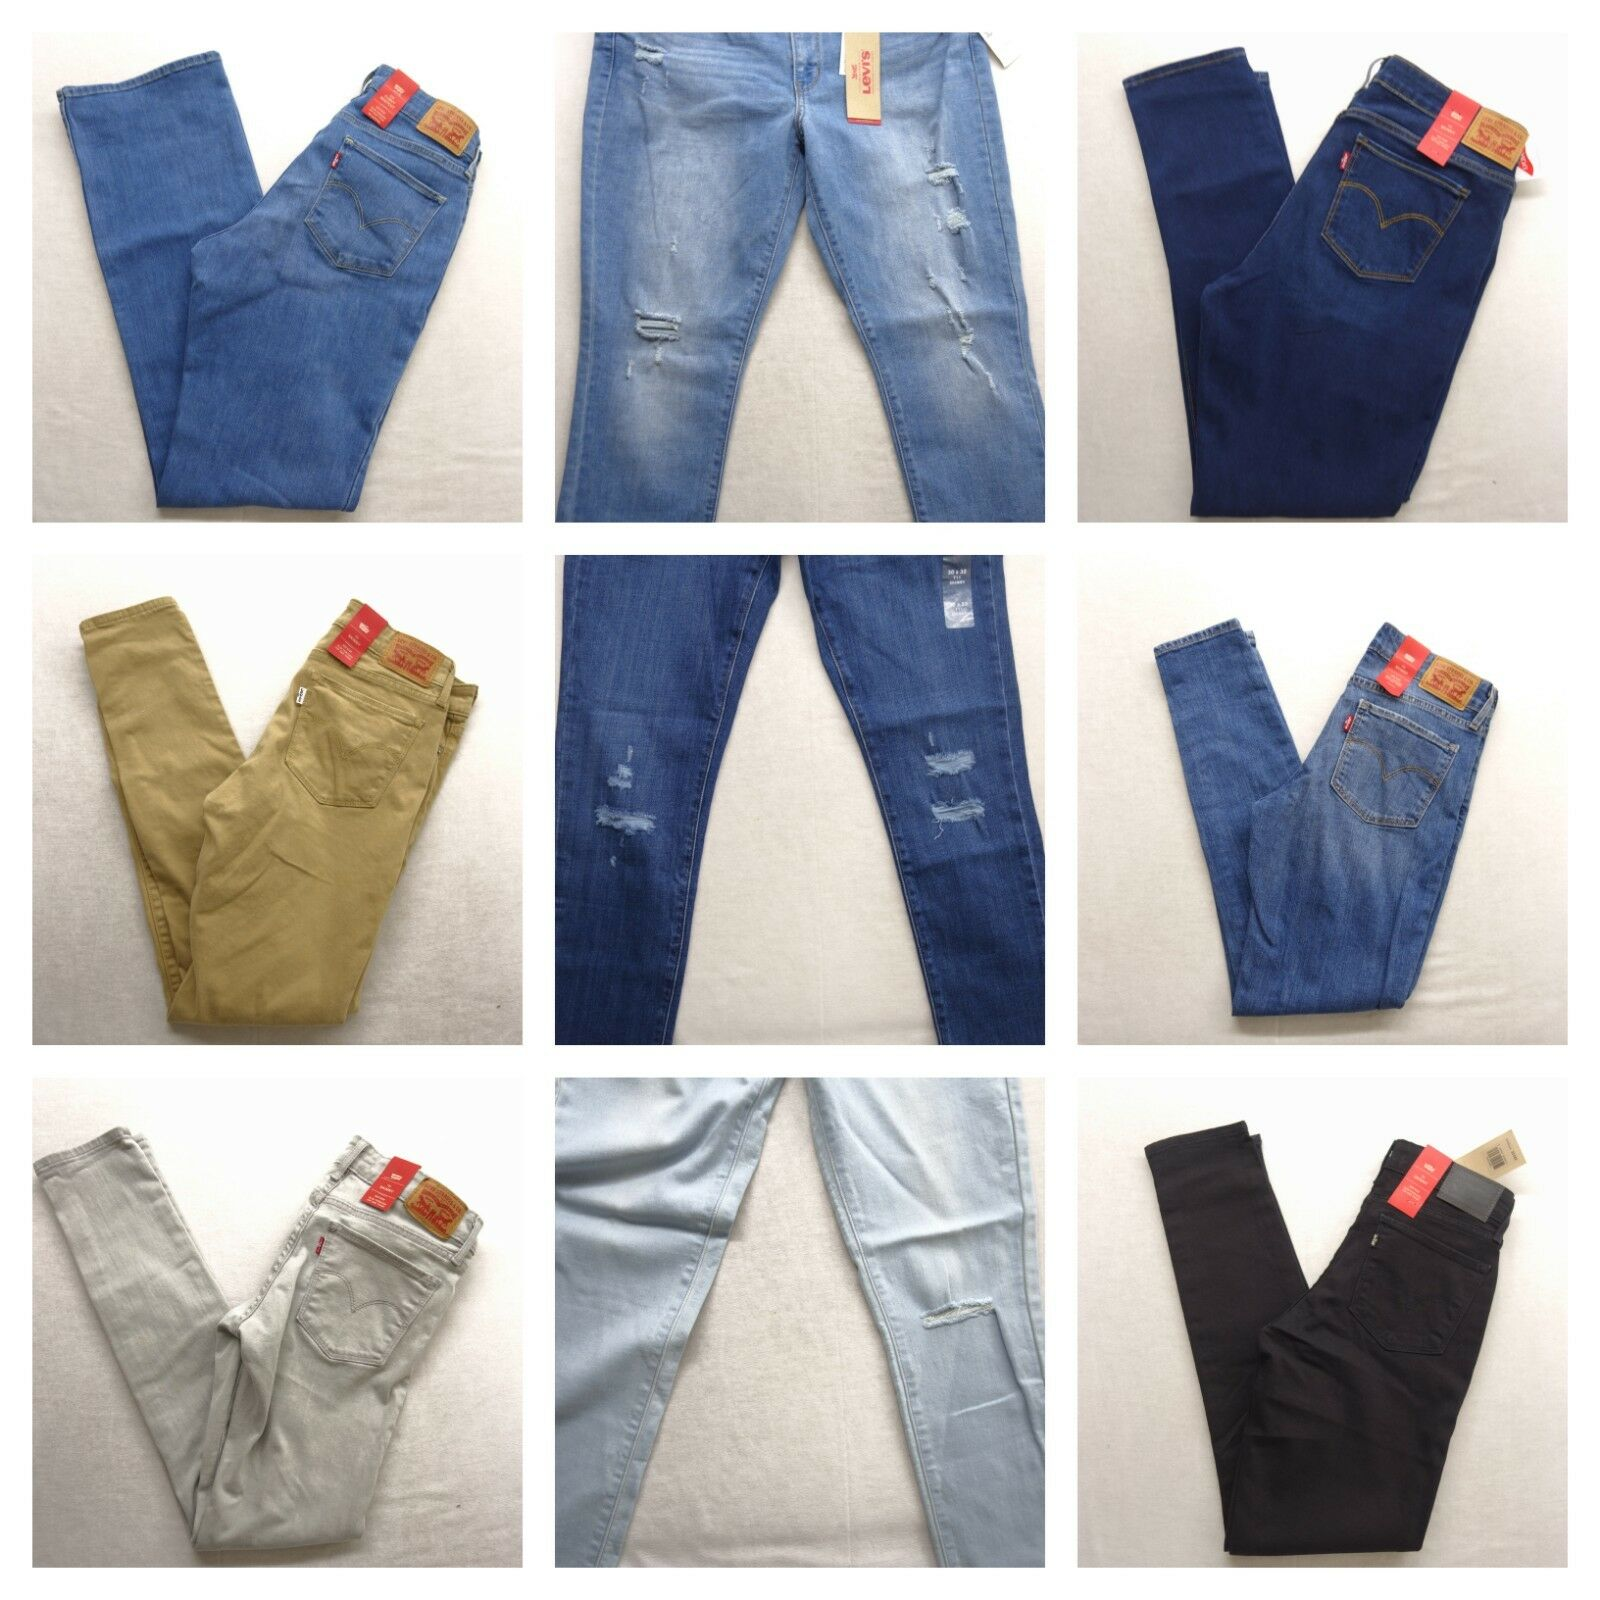 Levi's Womens 711 Skinny Stretch Denim Jeans Pants All Sizes